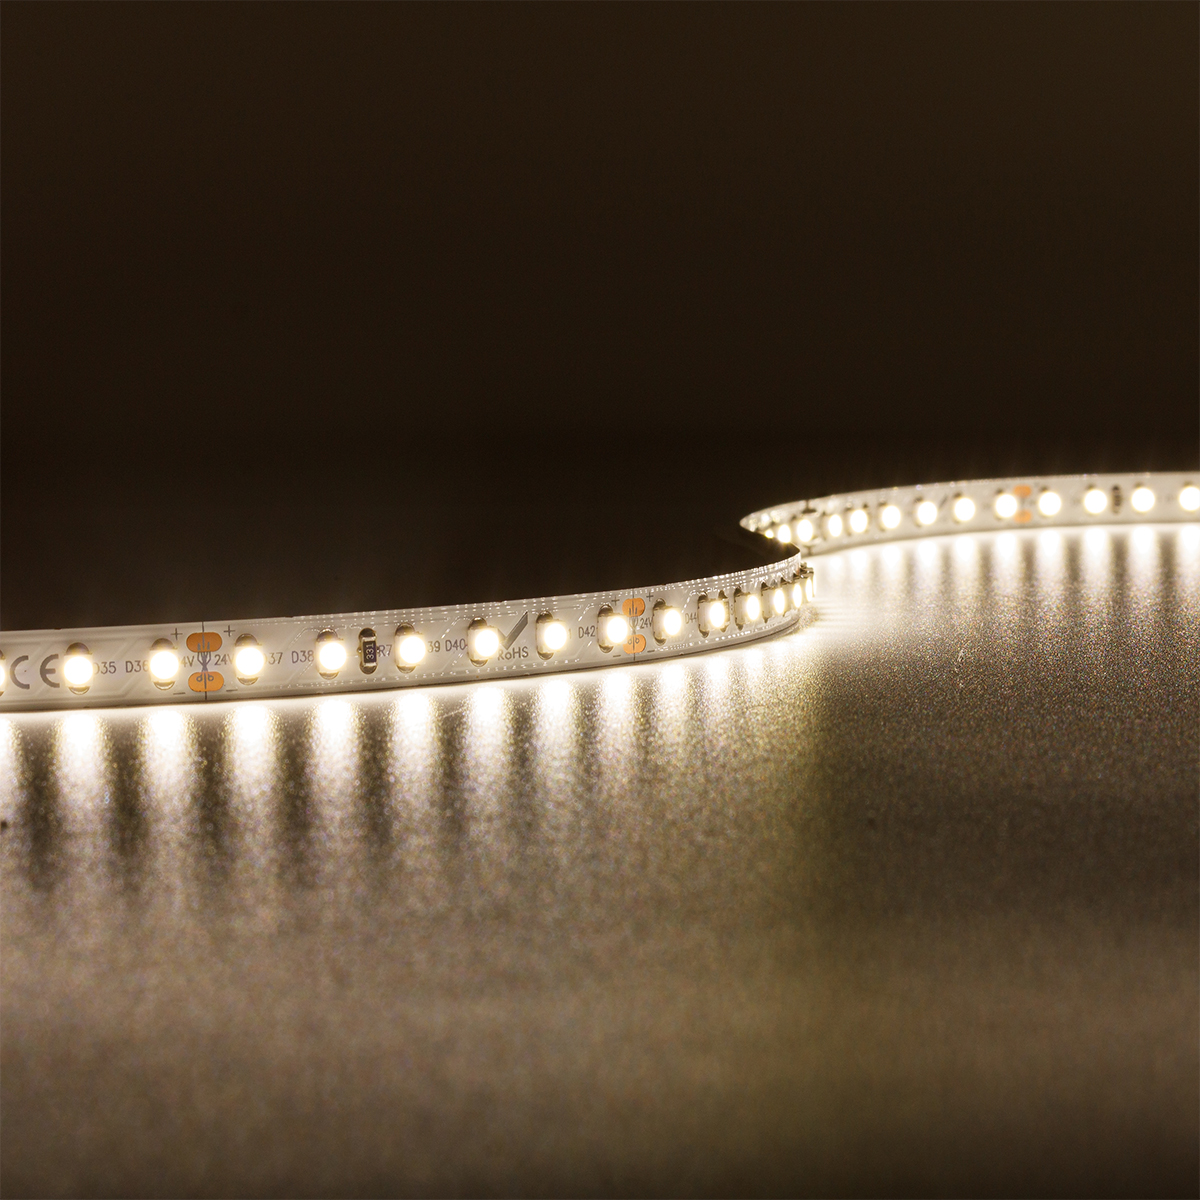 Strip Neutralweiß 24V LED Streifen 5M 9,6W/m 120LED/m 8mm IP20 4000K